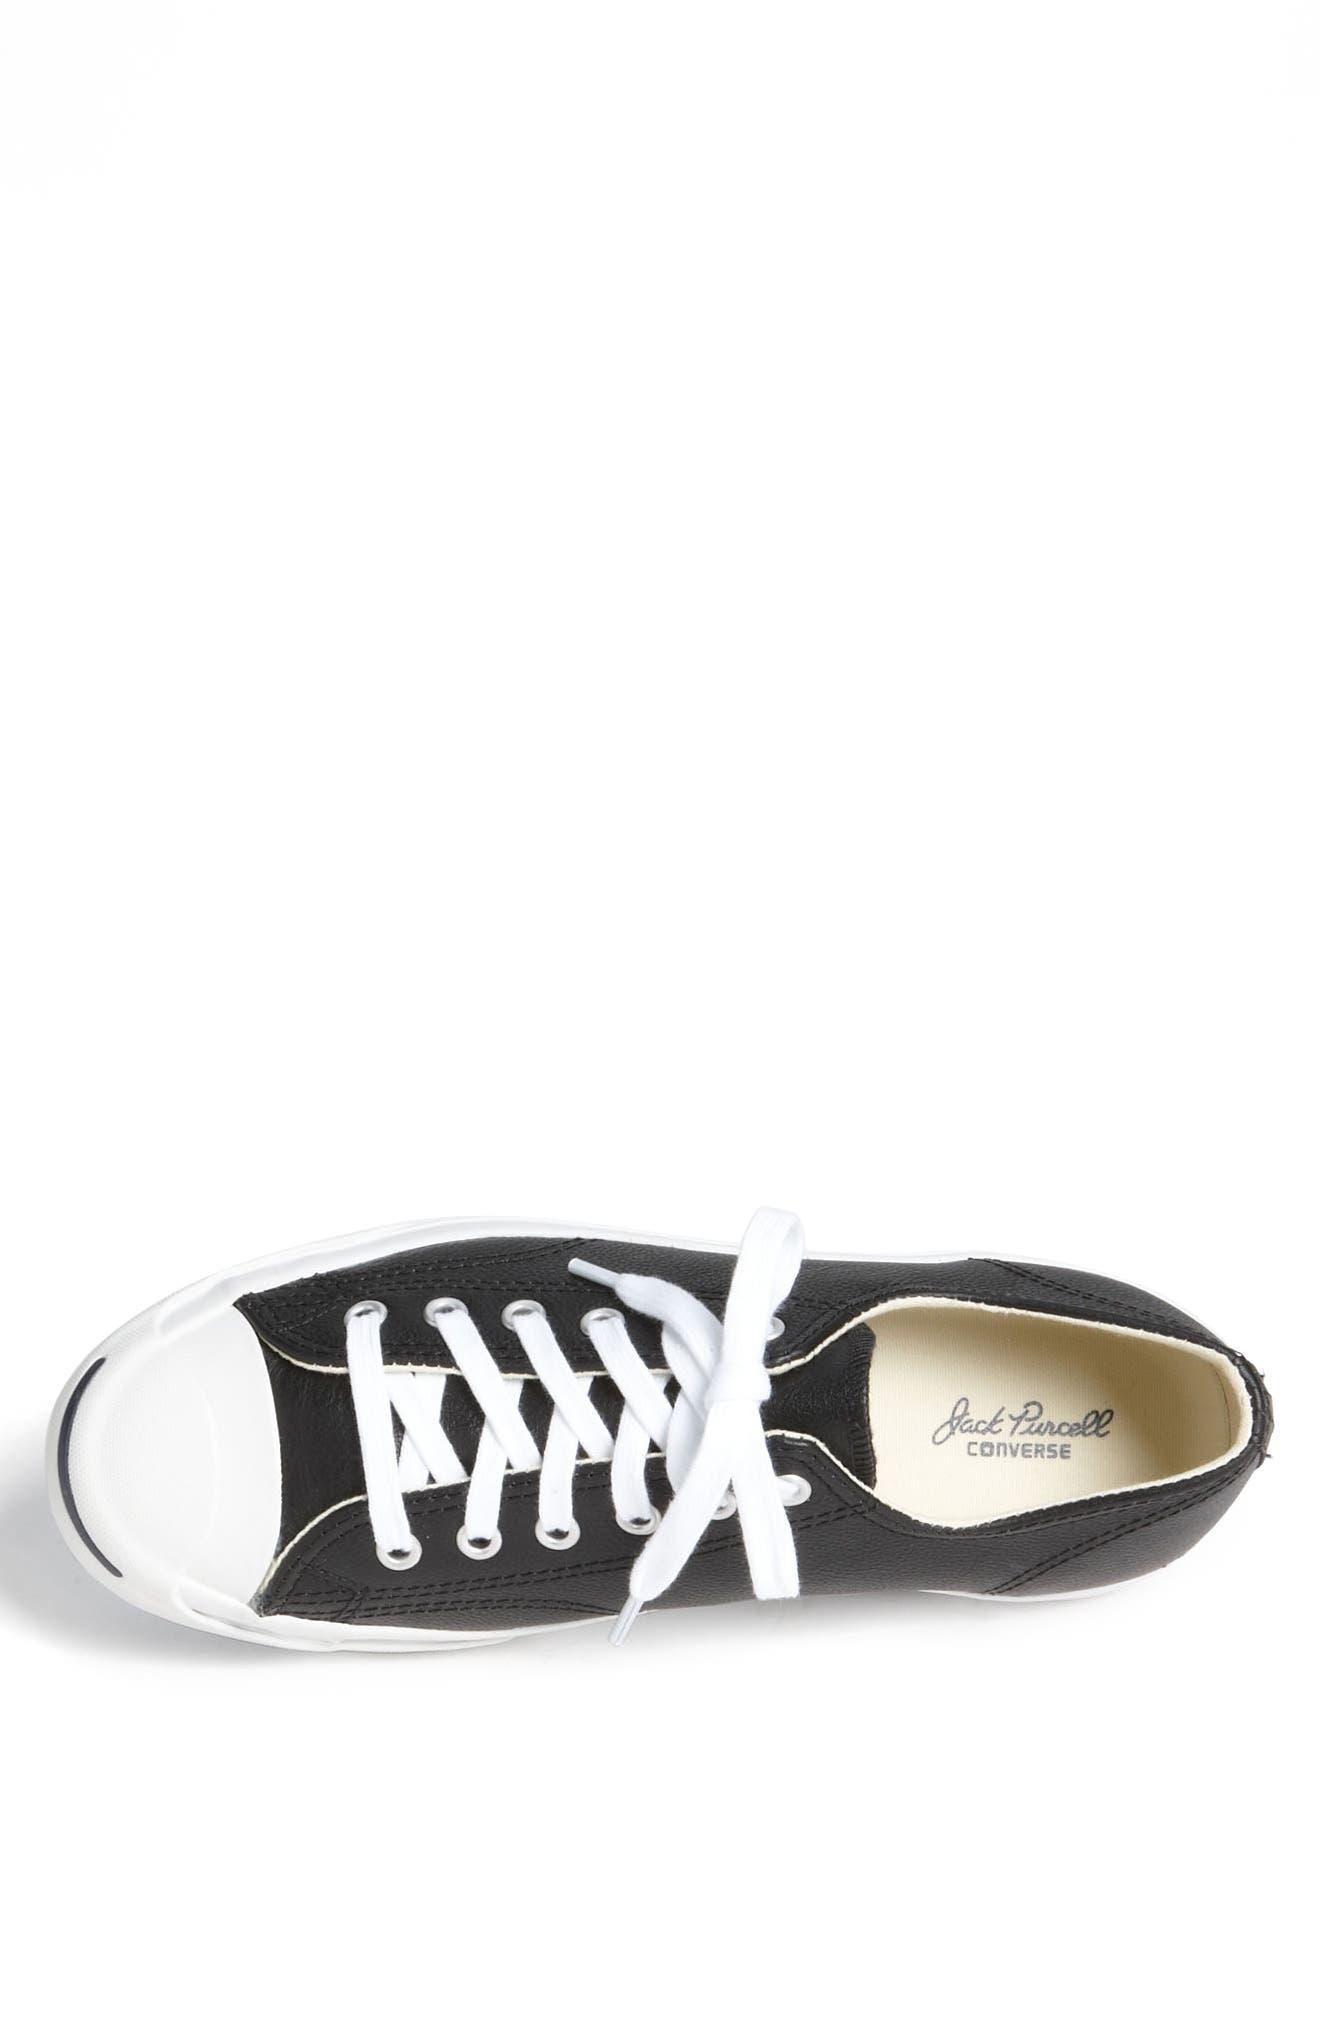 'Jack Purcell' Leather Sneaker,                             Alternate thumbnail 3, color,                             BLACK/ WHITE